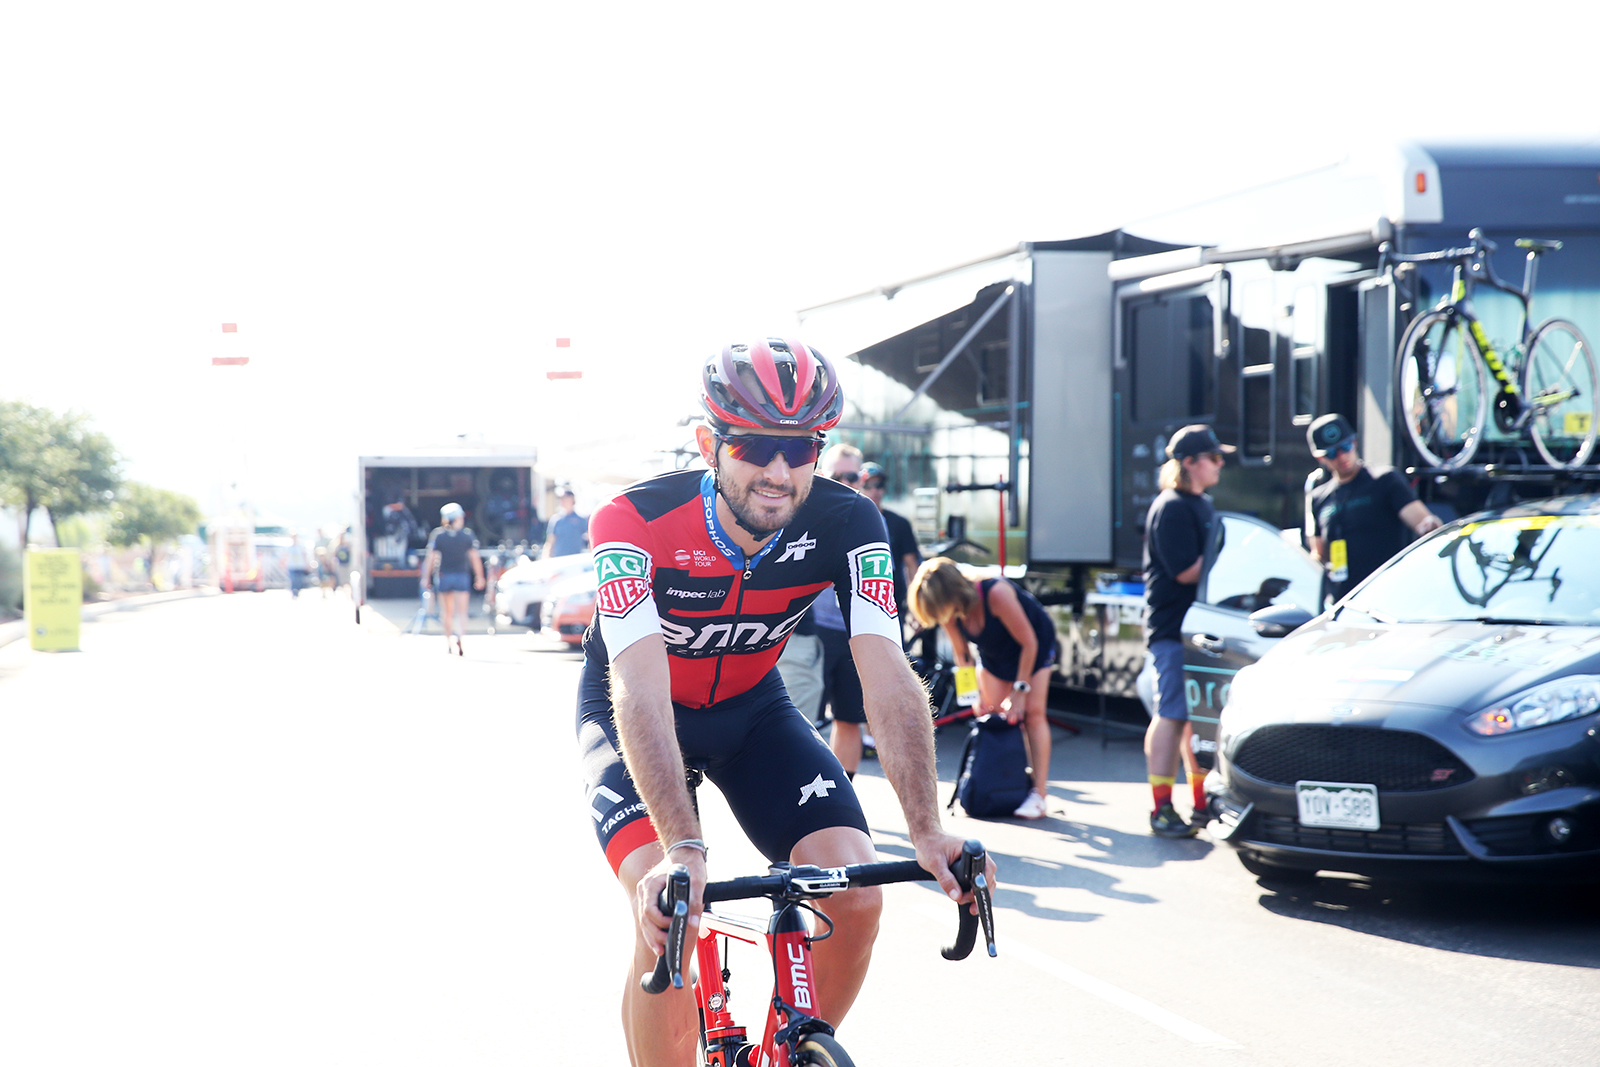 Joey Rosskopf, BMC. 2018 Tour of Utah Team Prologue, August 6, 2018, St. George, Utah. Photo by Cathy Fegan-Kim, cottonsoxphotography.net